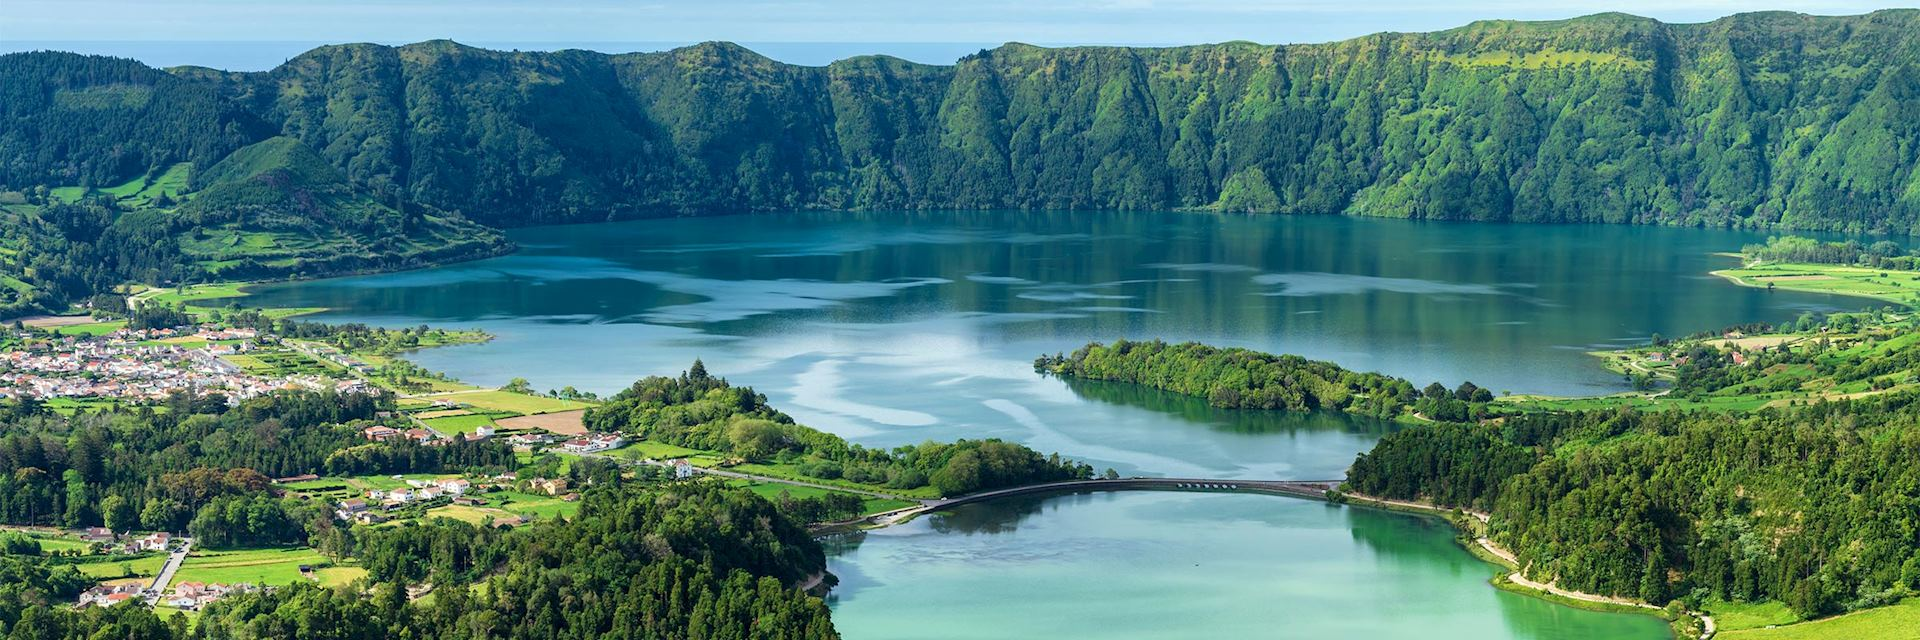 Twin lakes, Sete Cidades